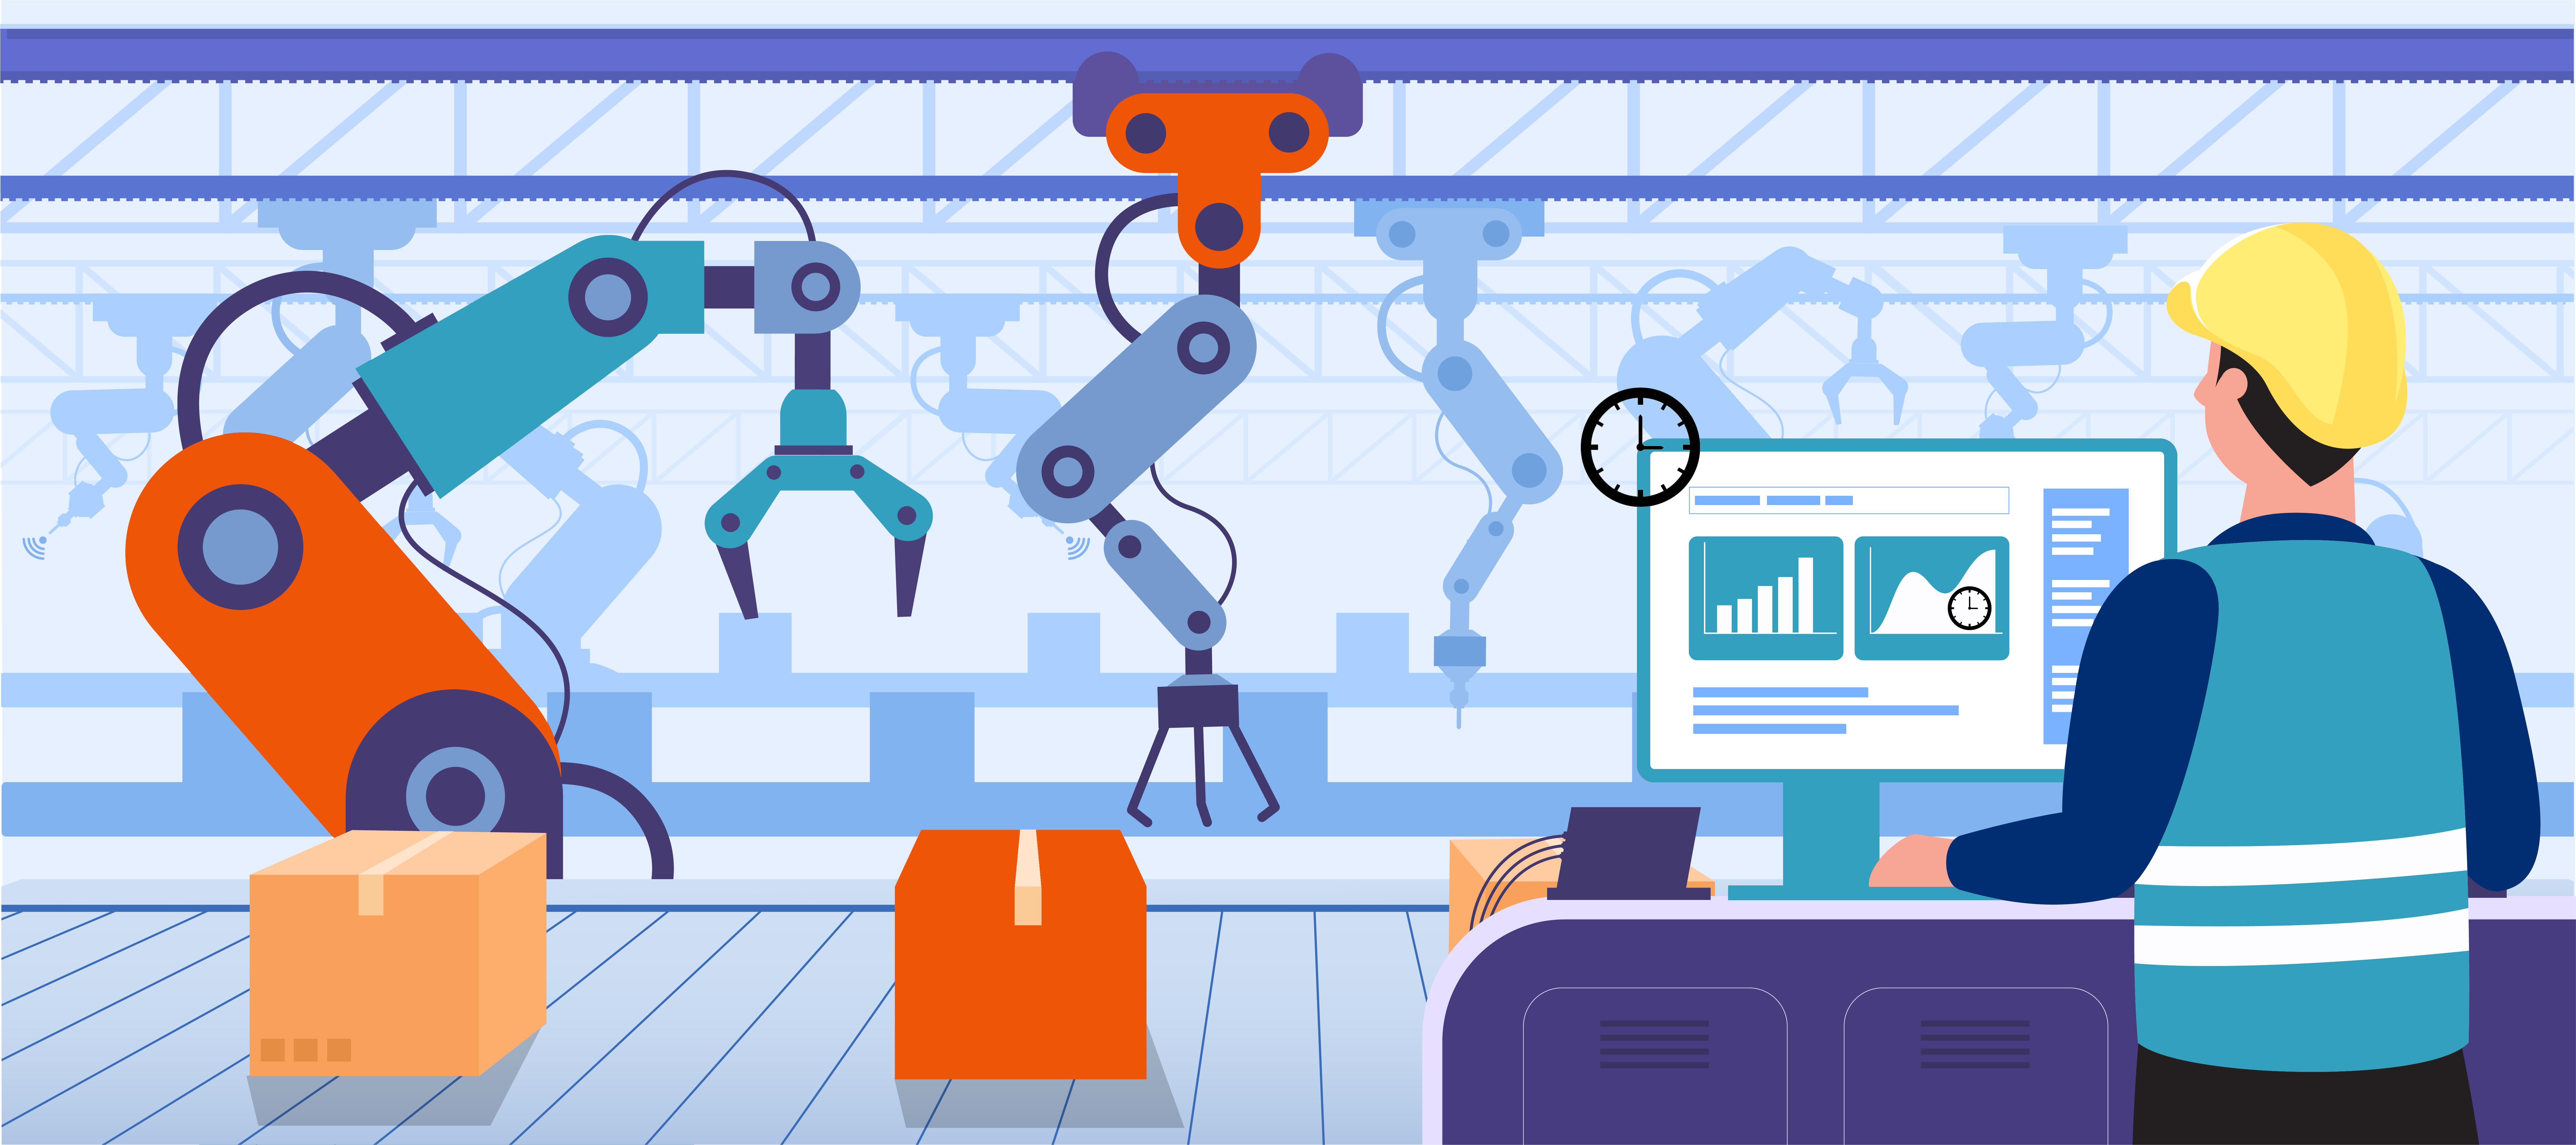 Combine data to achieve real-time risk intelligence - ZAPOJ CEM